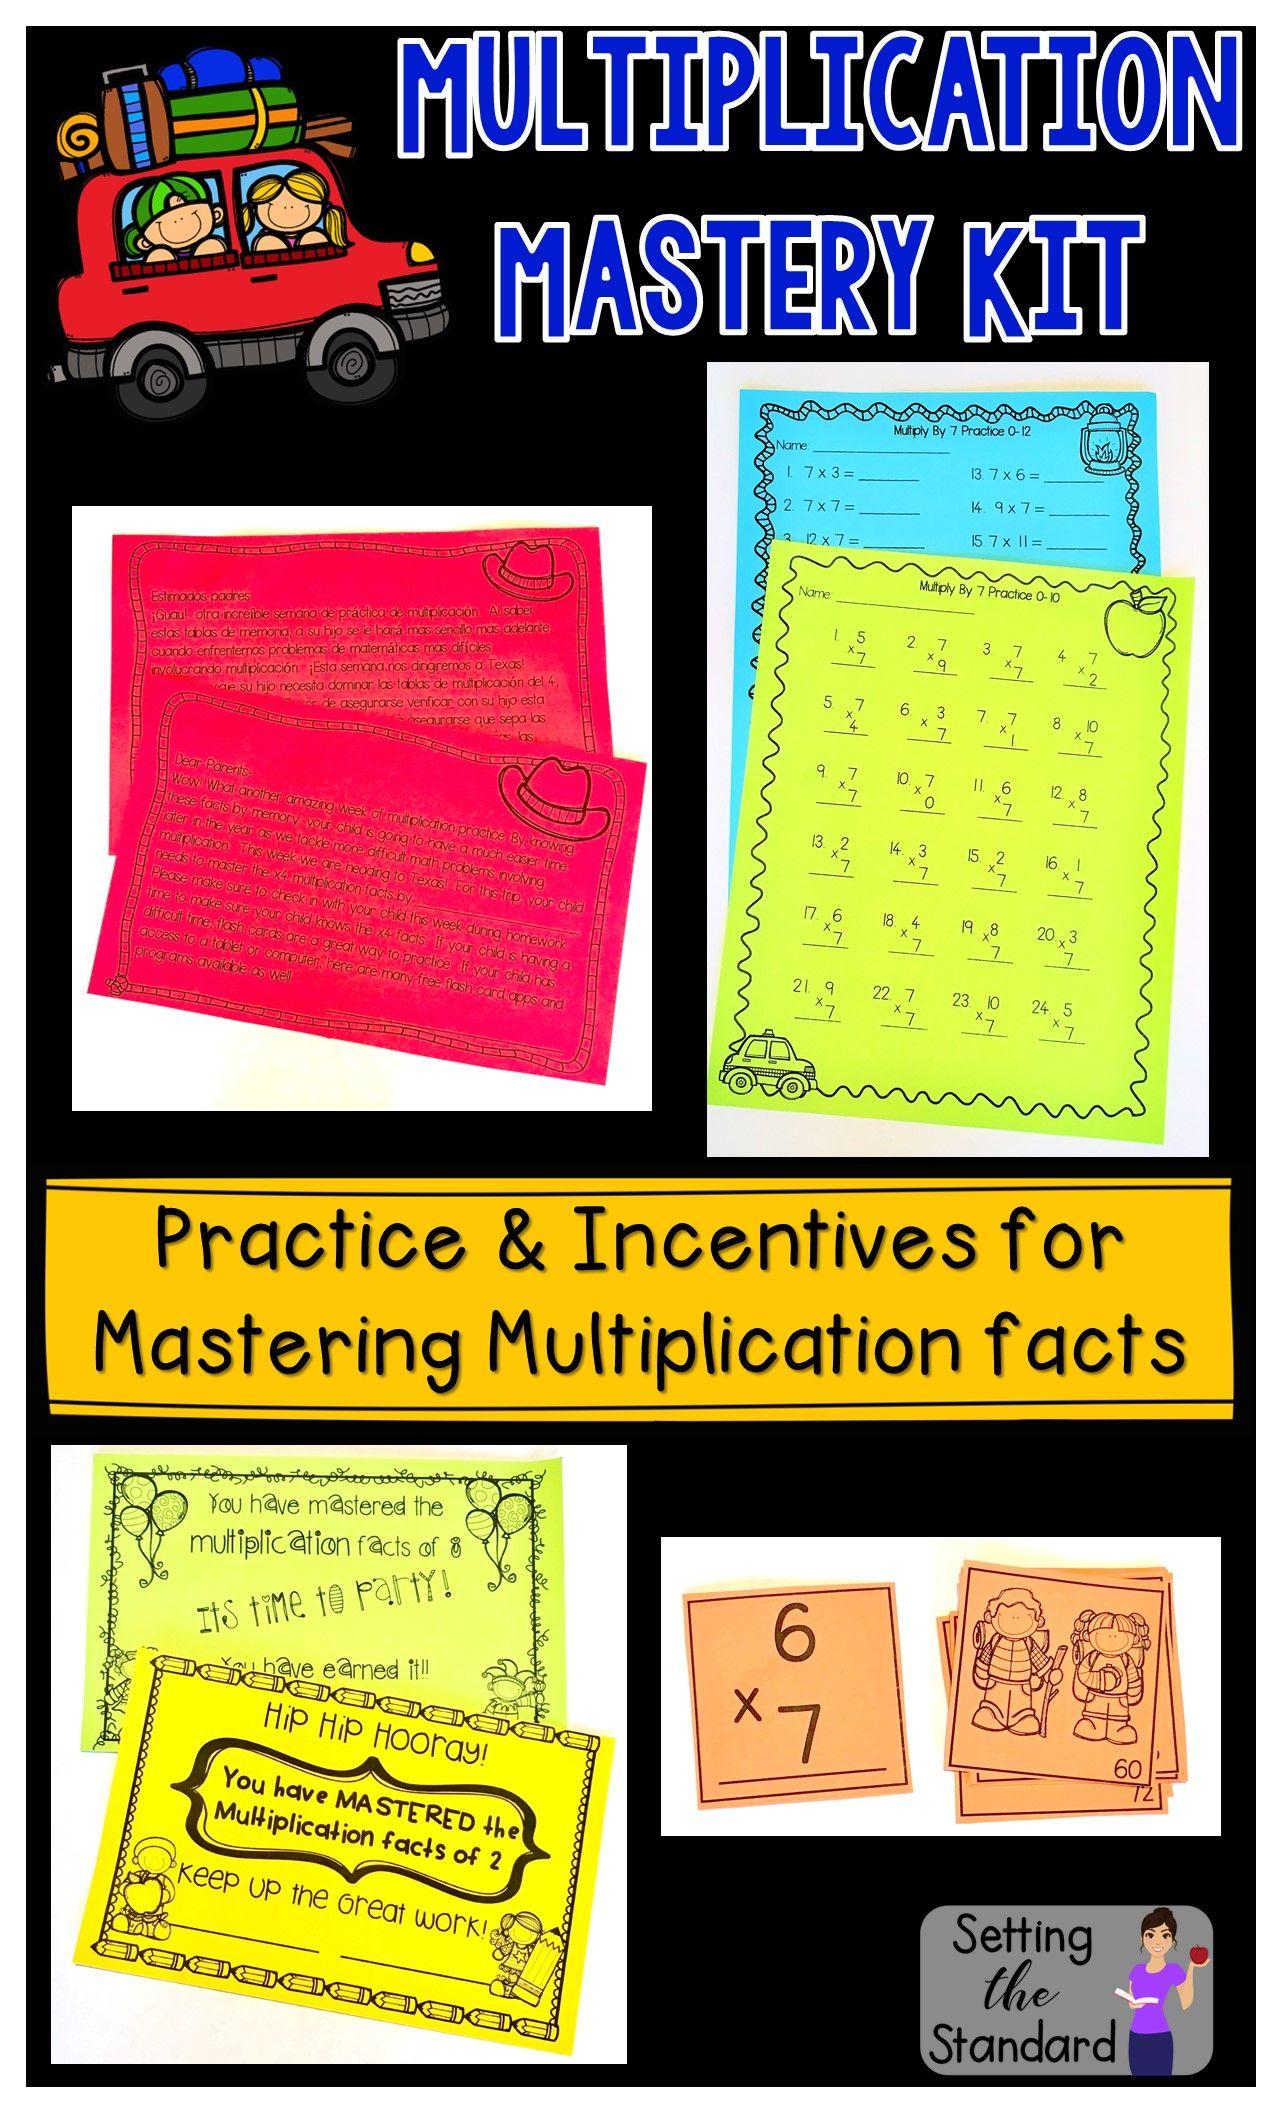 Multiplication Fact Incentive Unit Awards Flash Cards